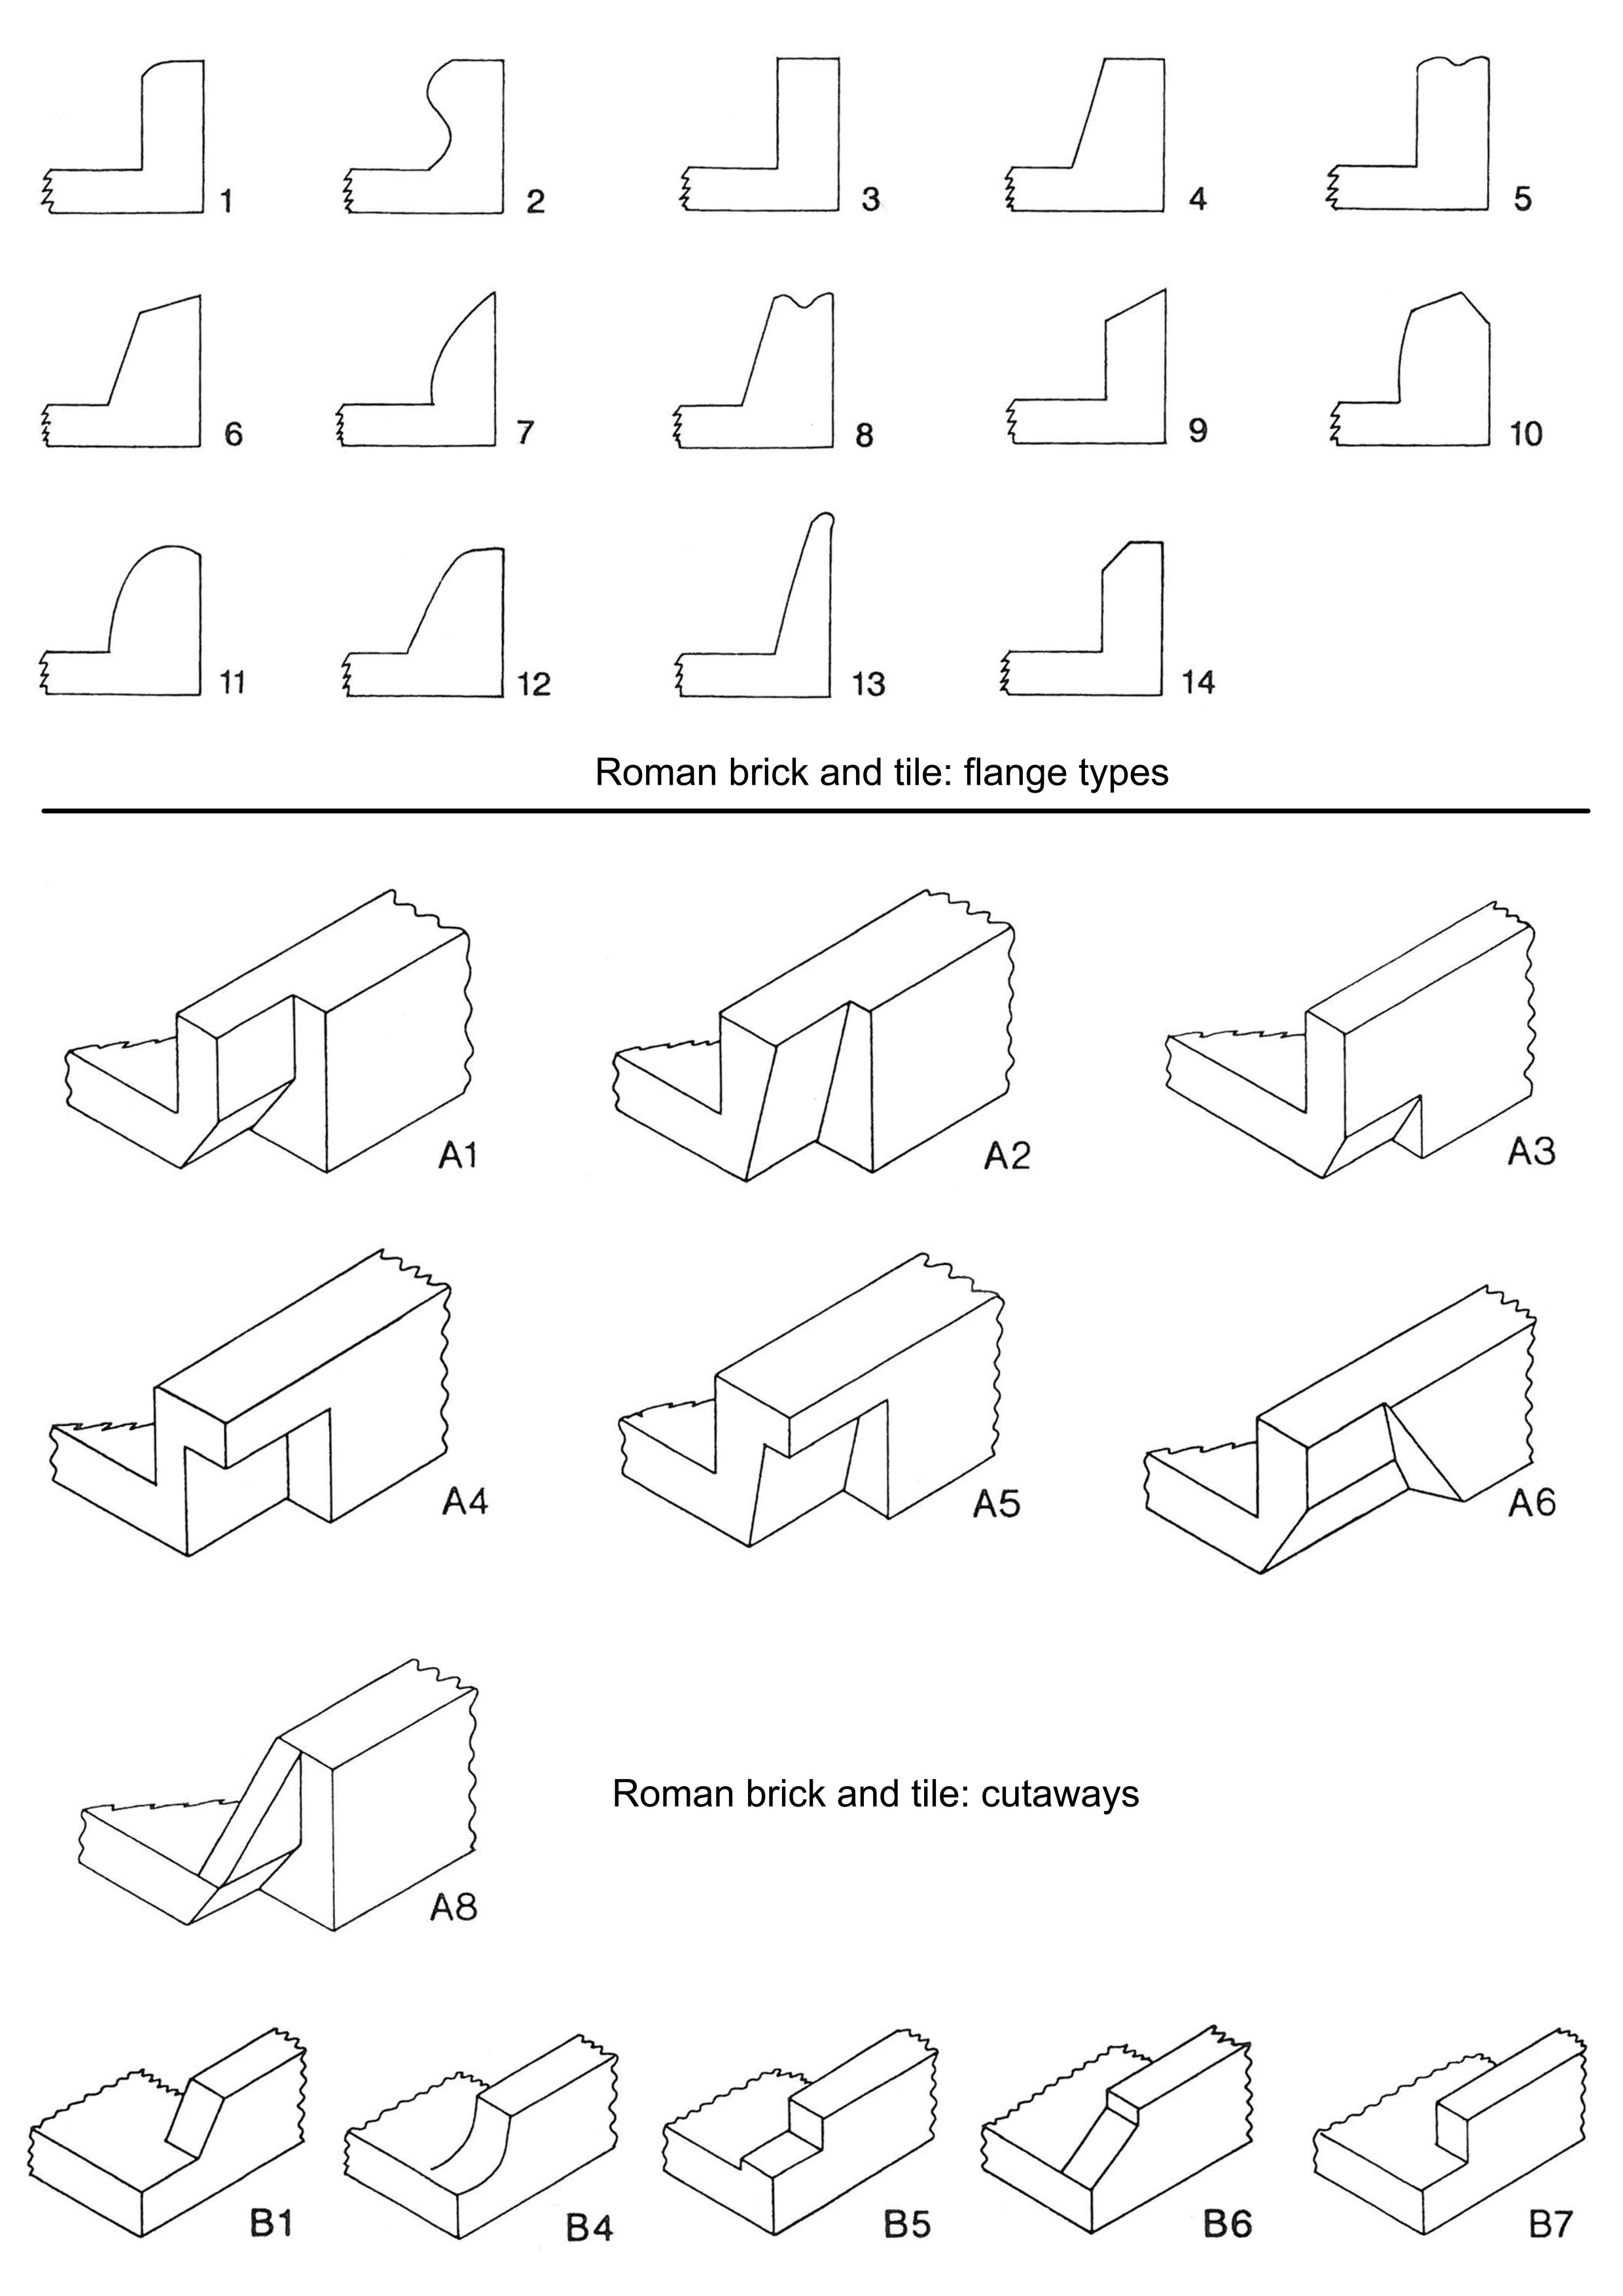 Internet Archaeol 40 Atkinson And Preston Buildings Services Automotive Diagrams Archives Page 185 Of 301 Wiring Figure 719 Roman Brick Tile Flanges Cut Aways